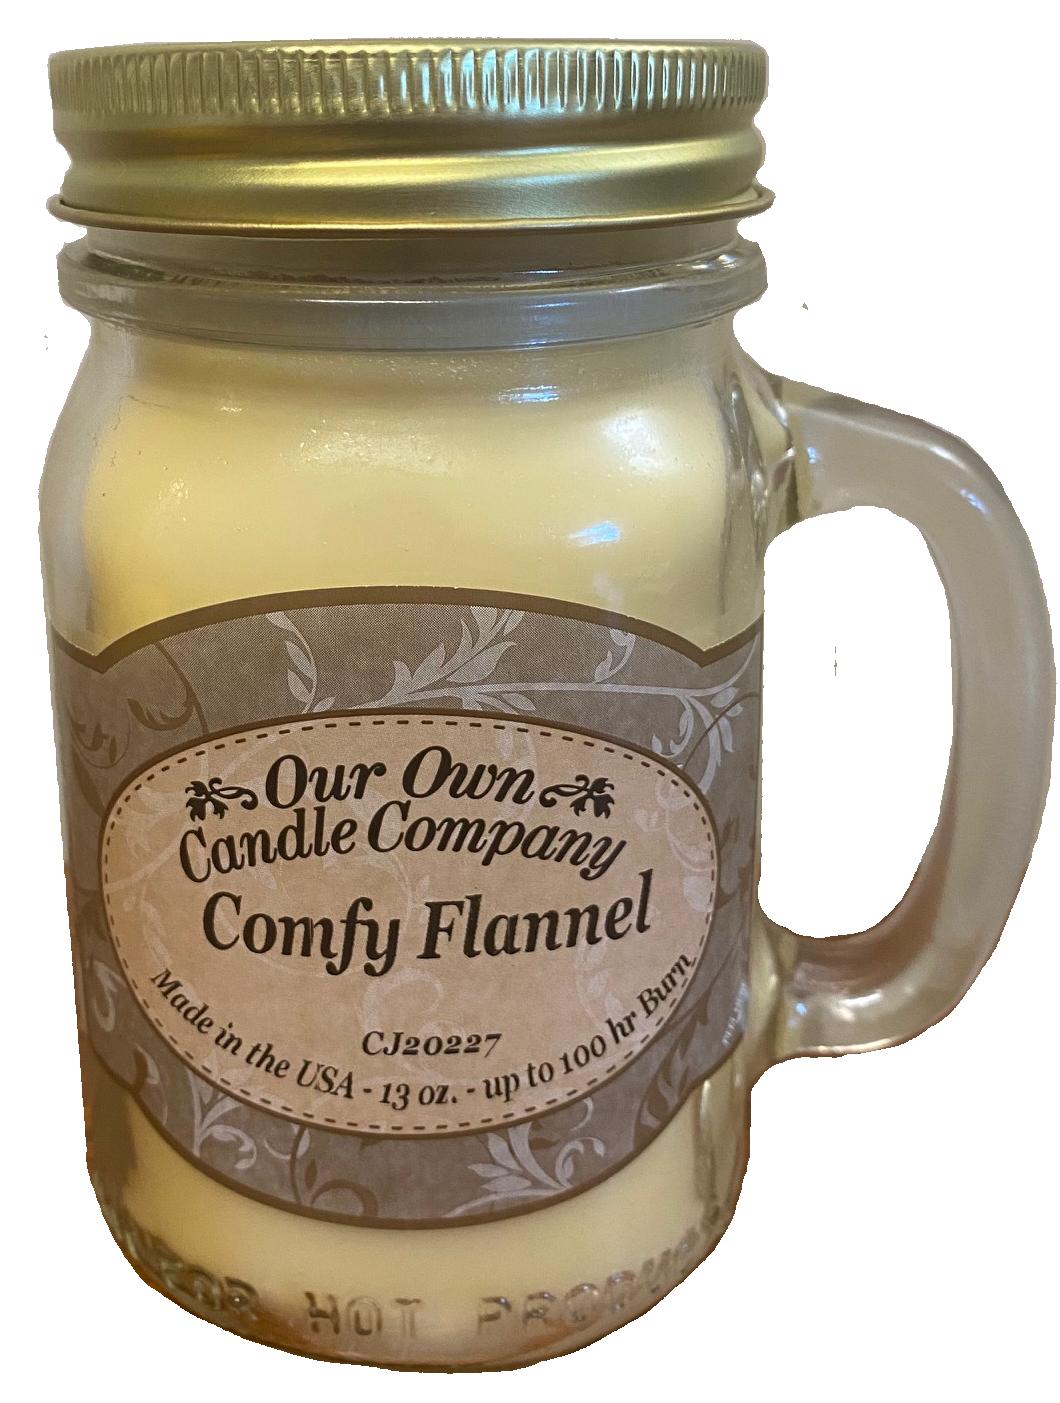 Comfy Flannel Mason